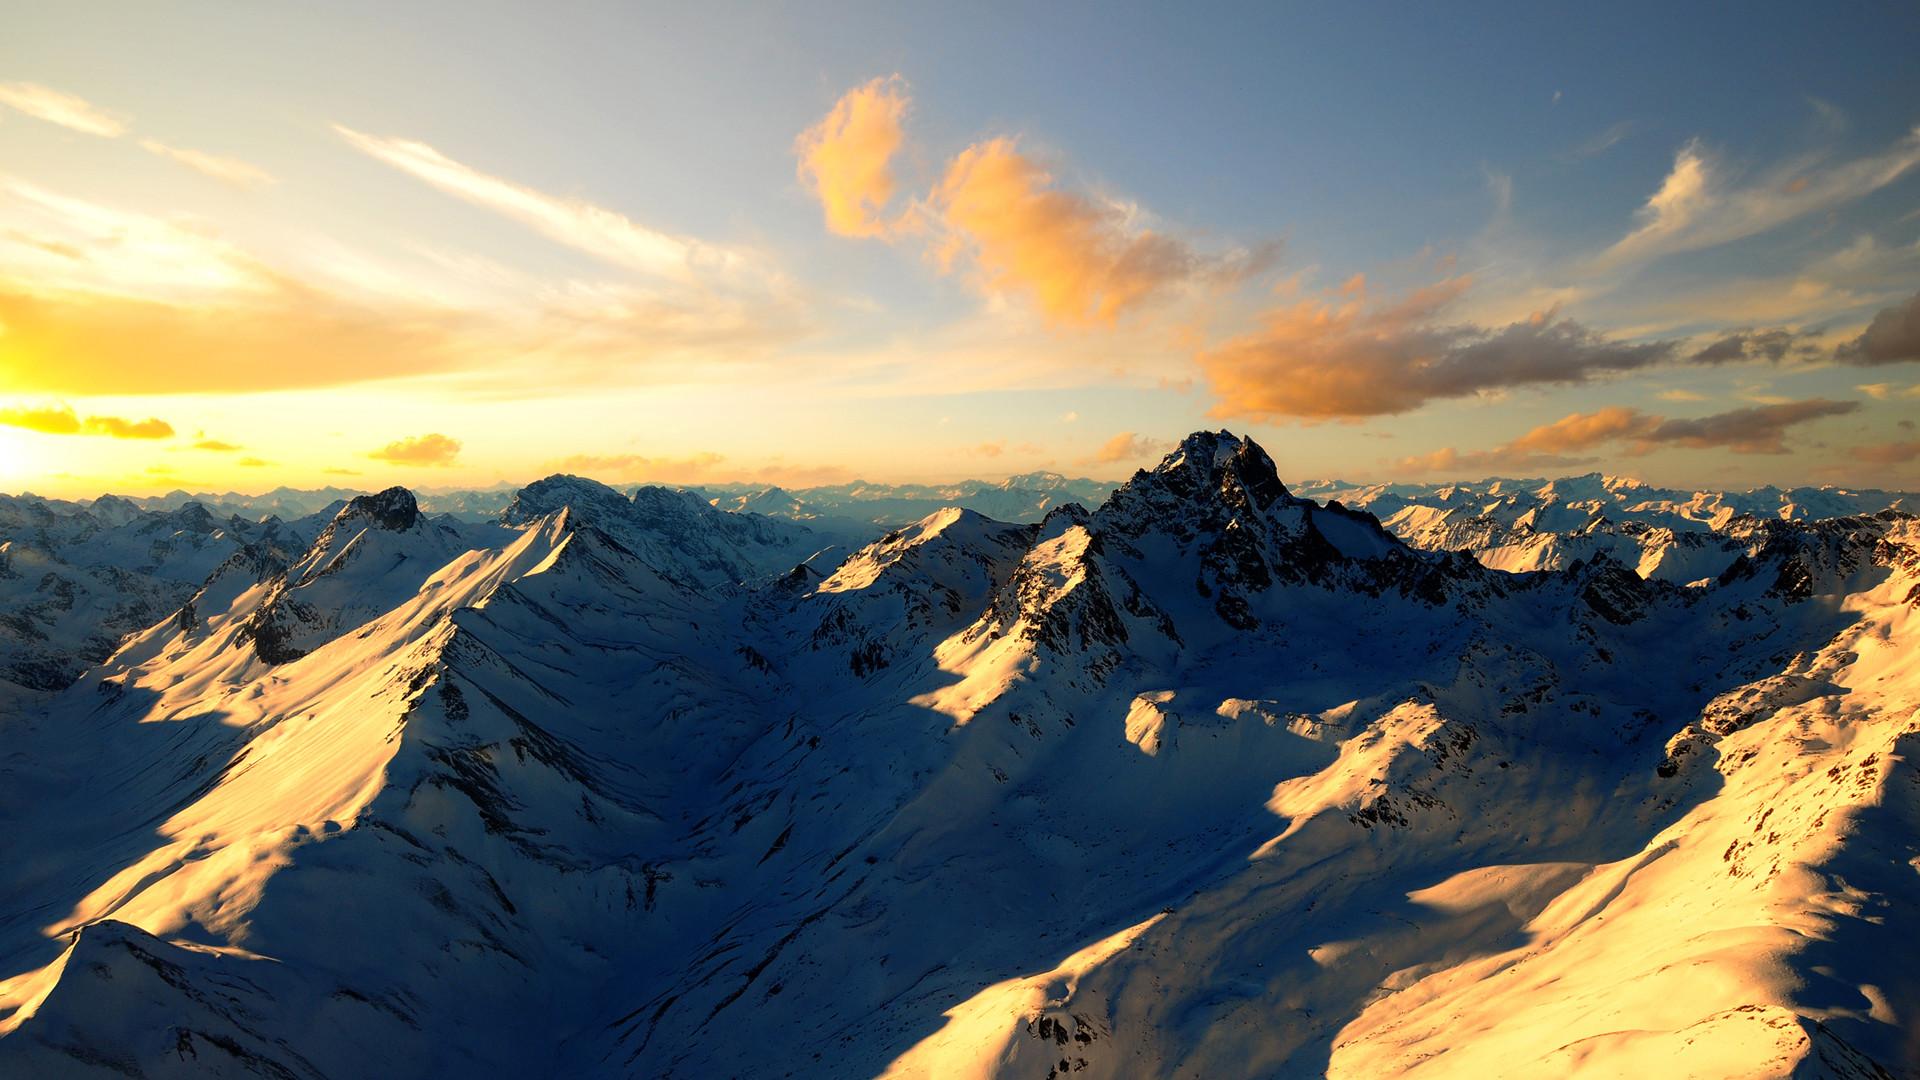 Cool Mountain Range Wallpaper